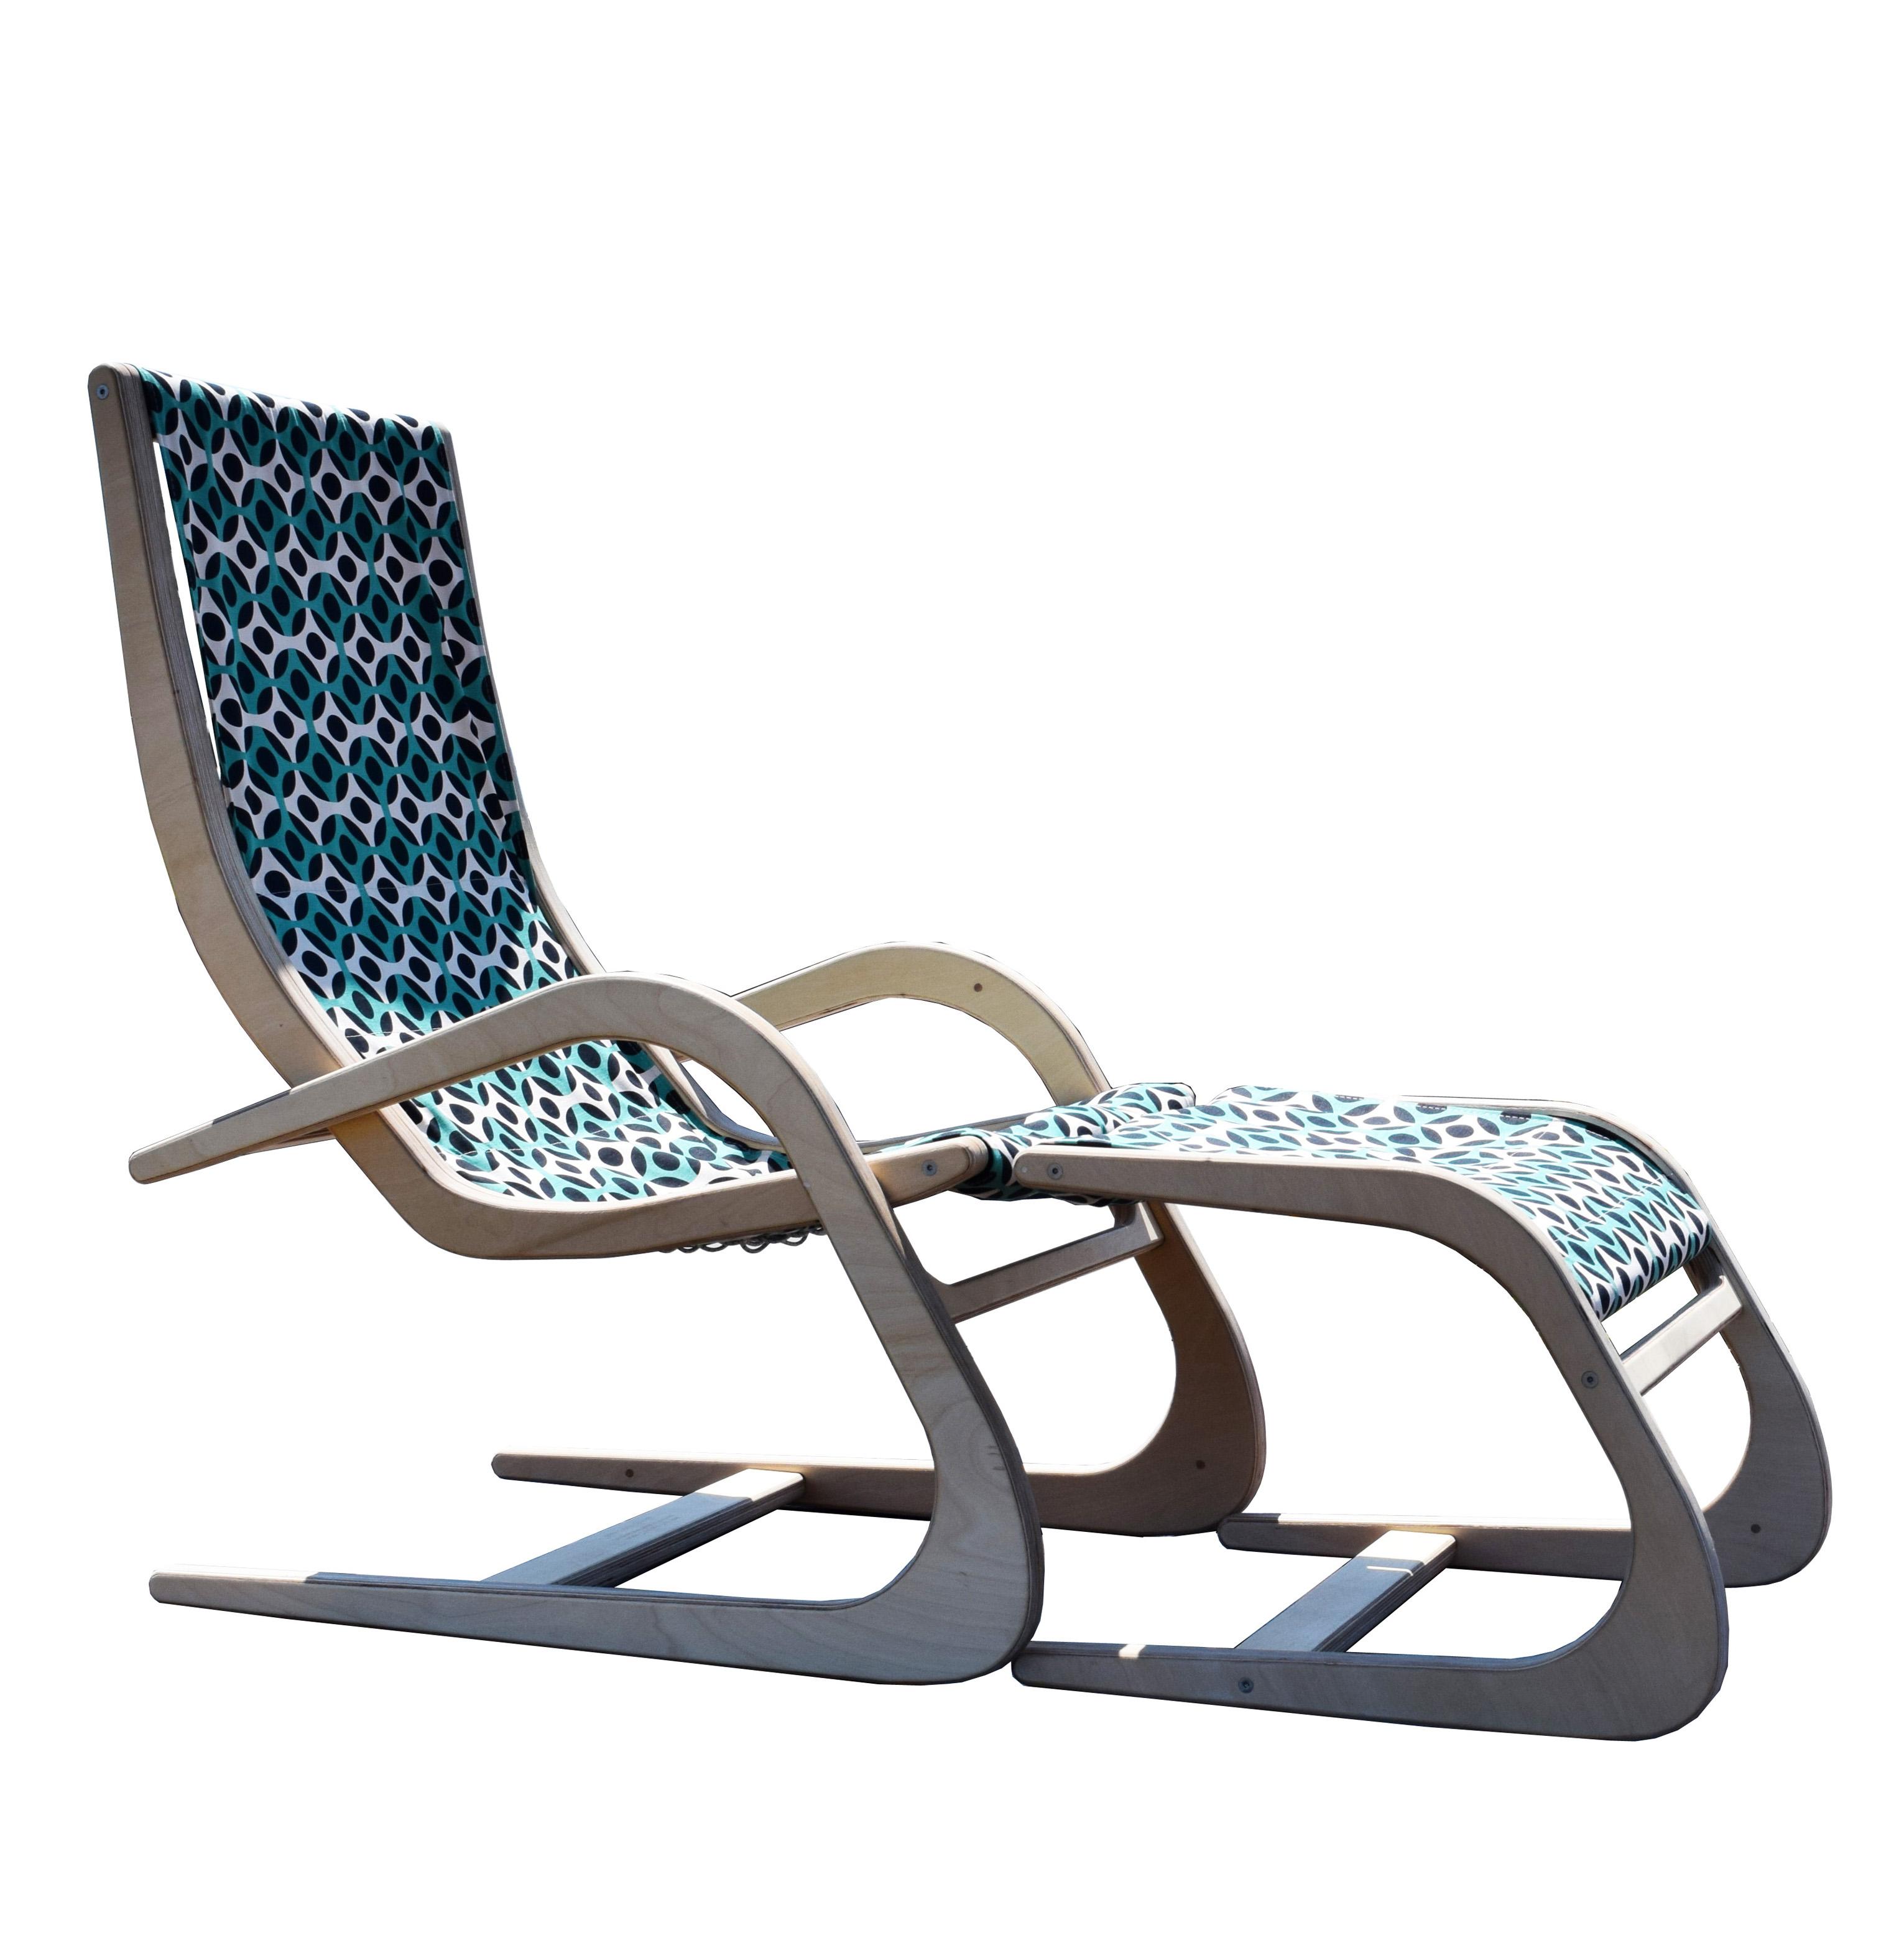 Fantastic Onada Lounge Chair Foot Stool Brazil Alphanode Cool Chair Designs And Ideas Alphanodeonline